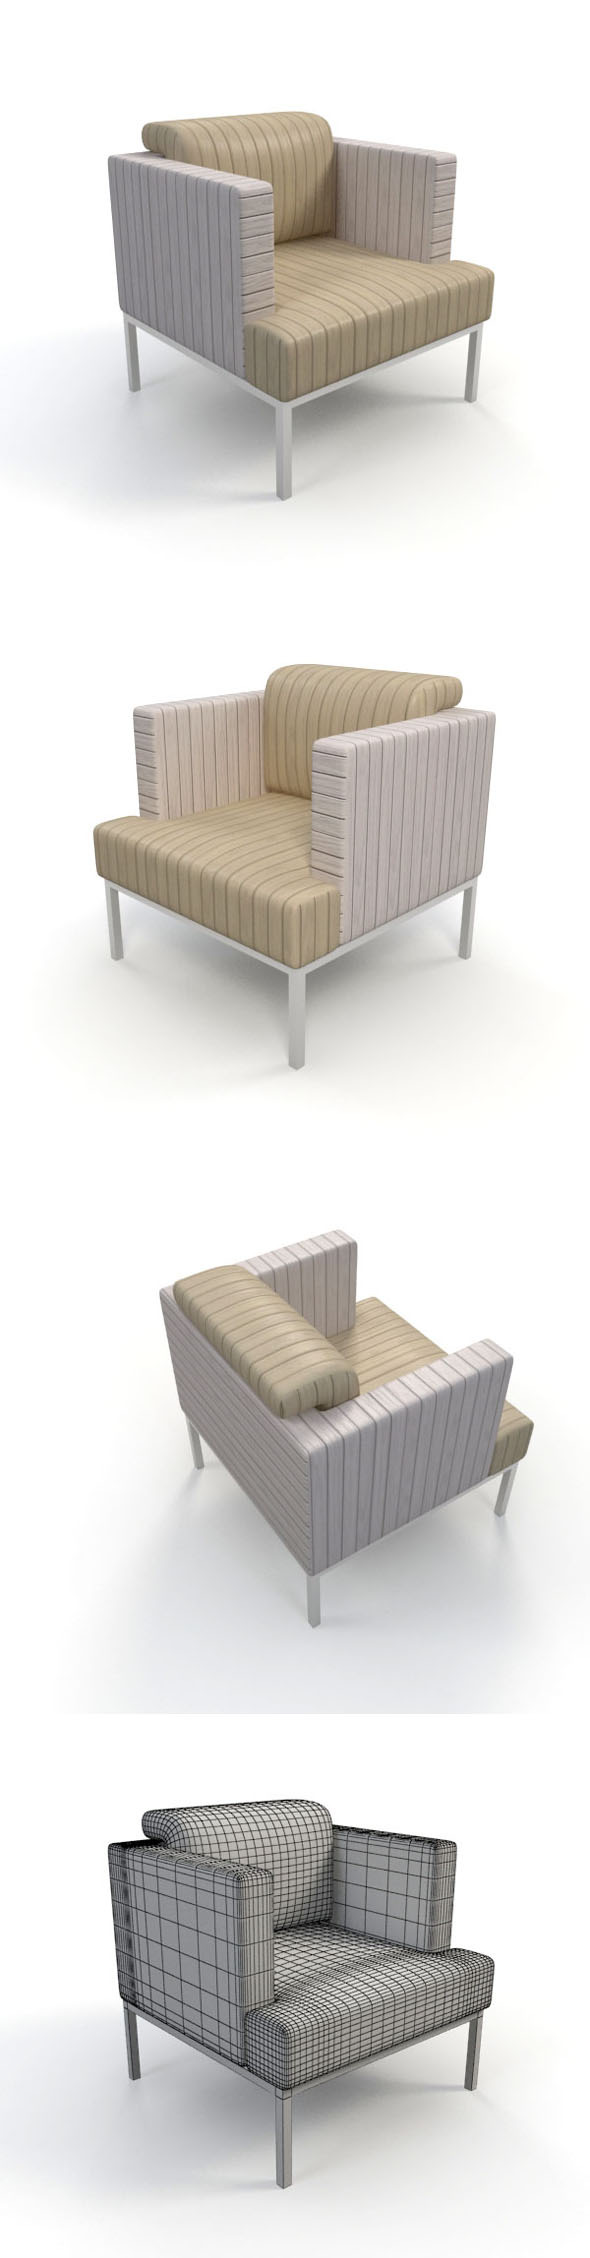 Sofa-12 - 3DOcean Item for Sale